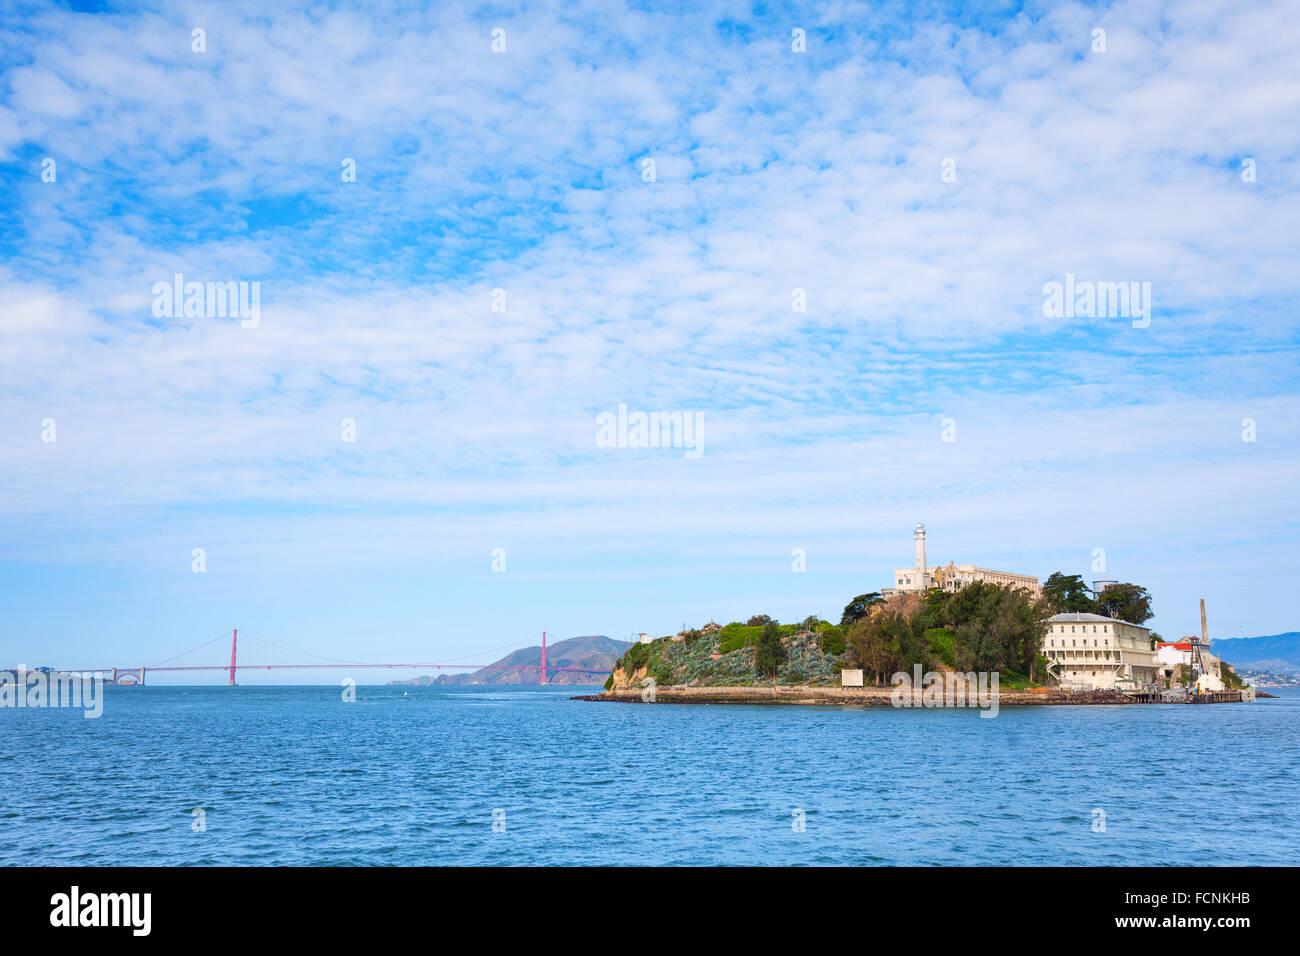 Golden Gate bridge and Alcatraz from SF bay - Stock Image